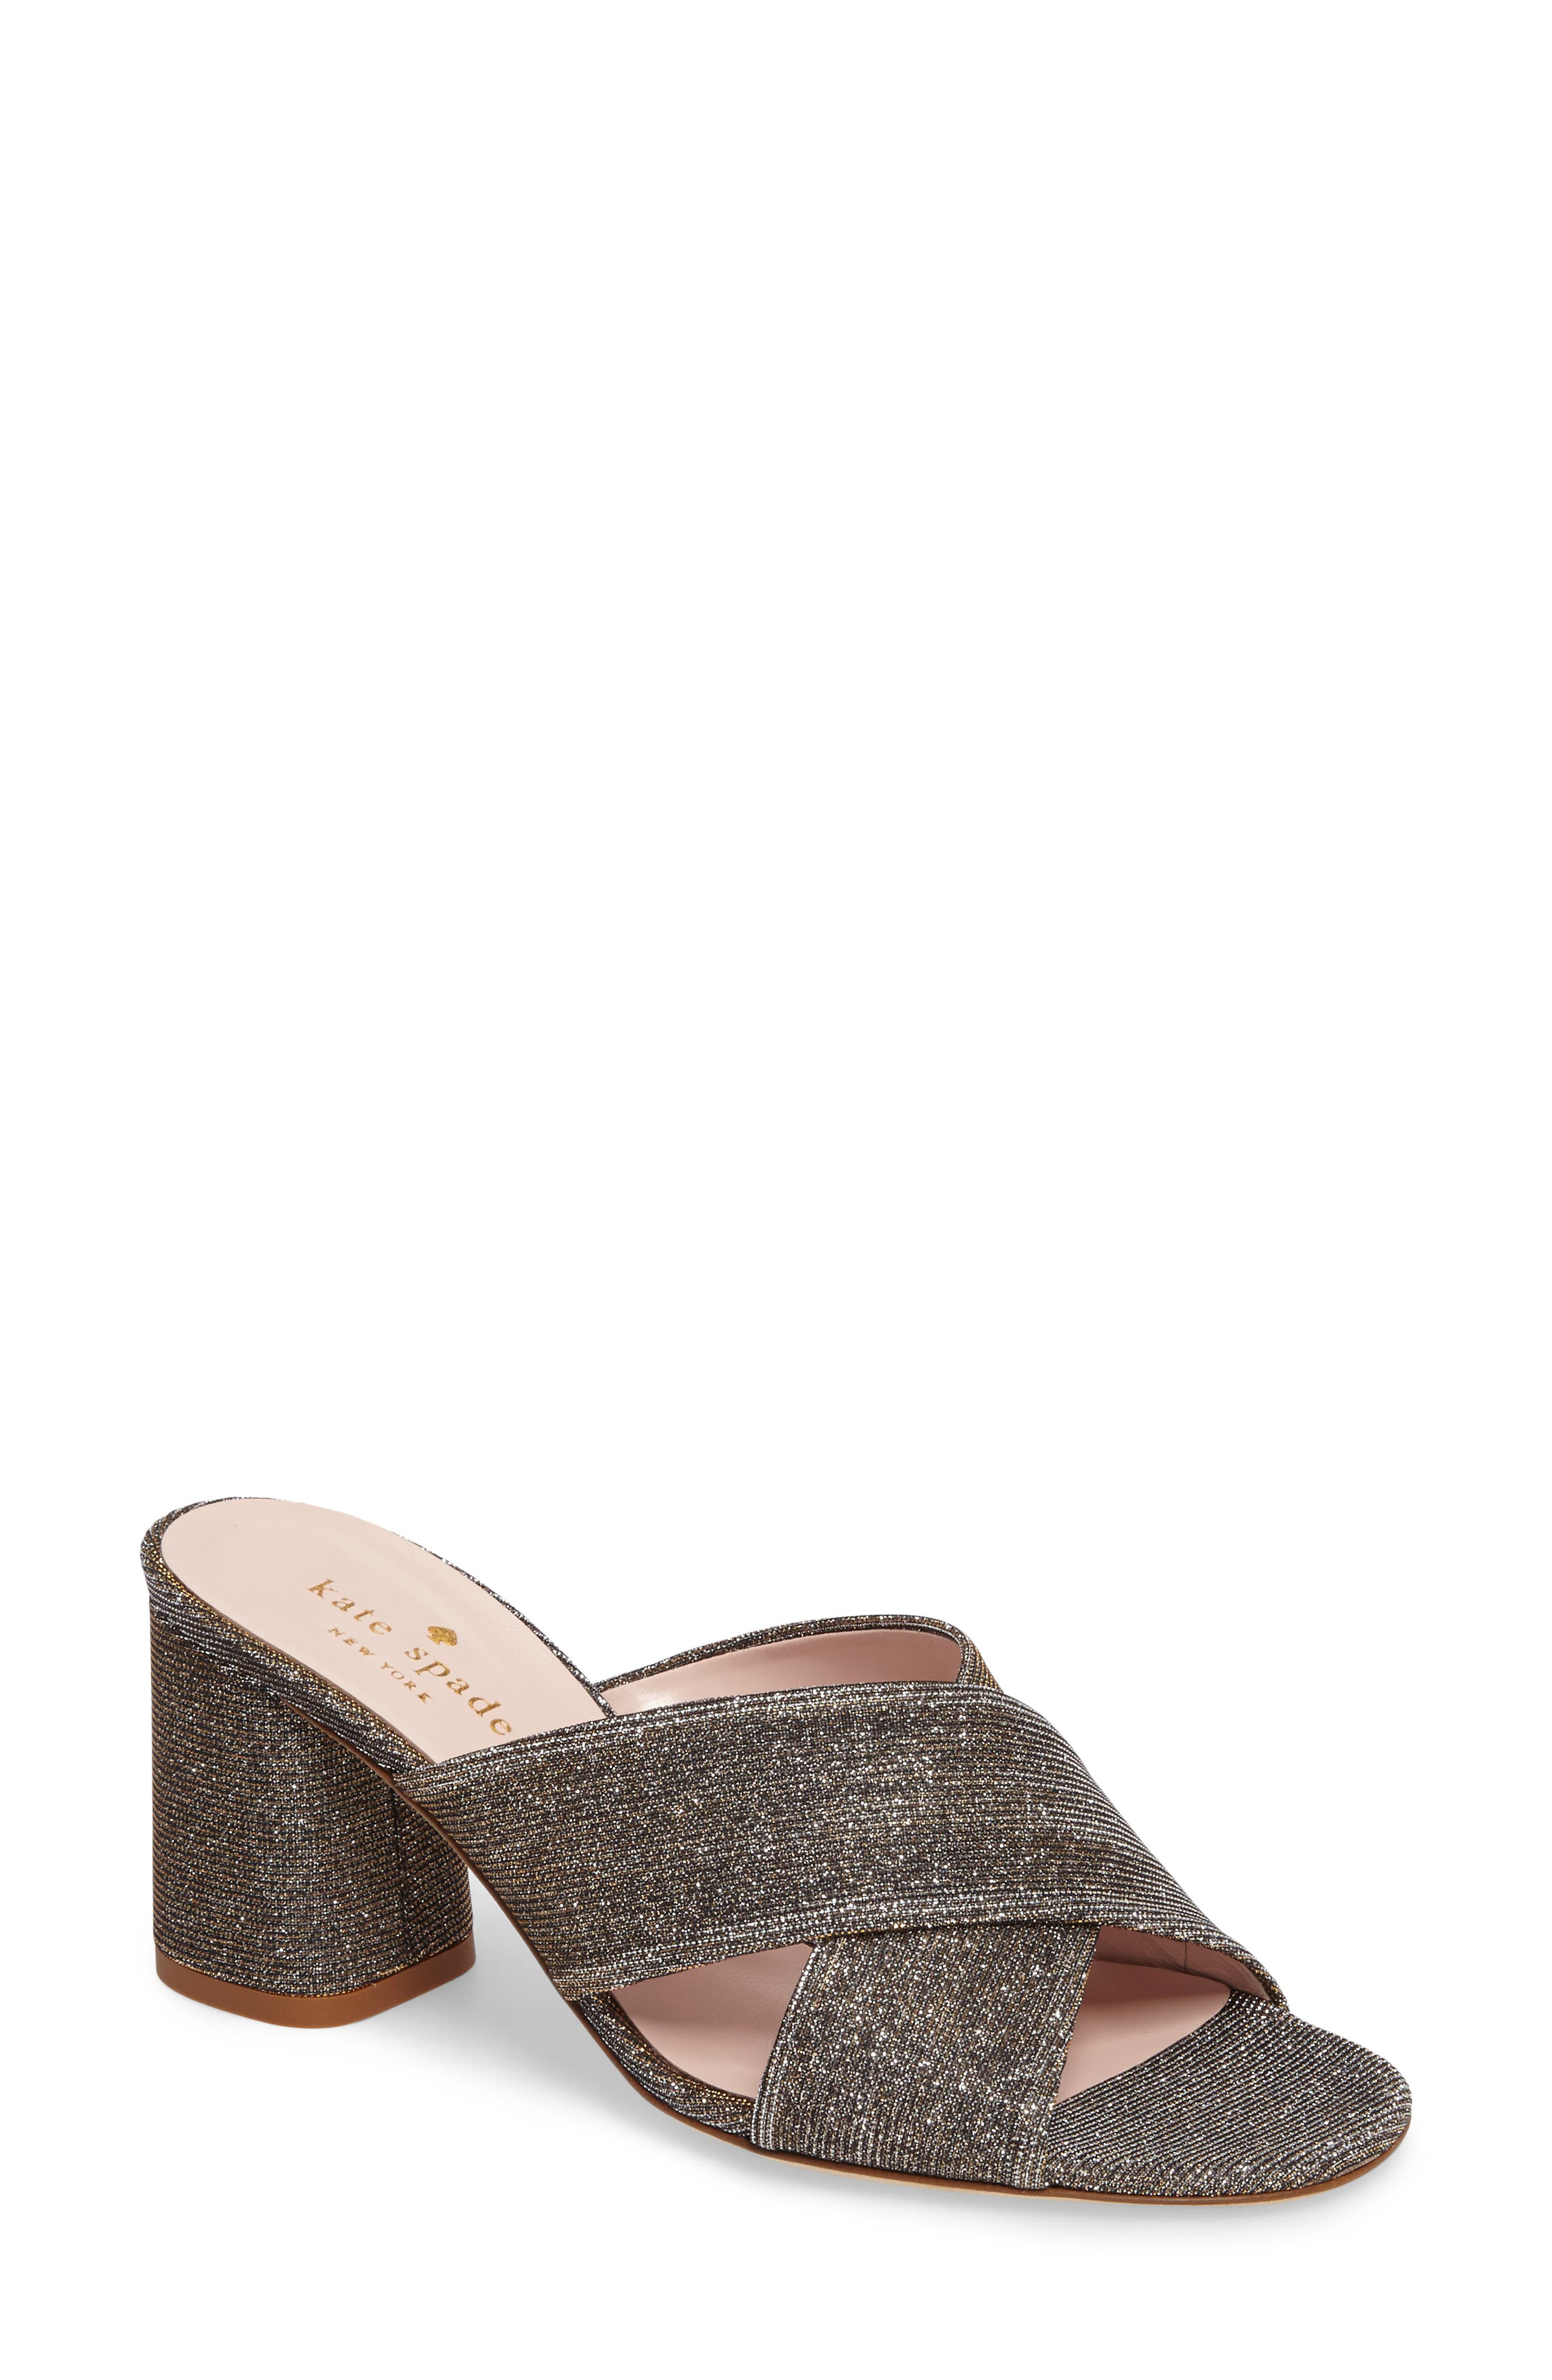 denault slide sandal,                             Main thumbnail 1, color,                             Bronze Lurex